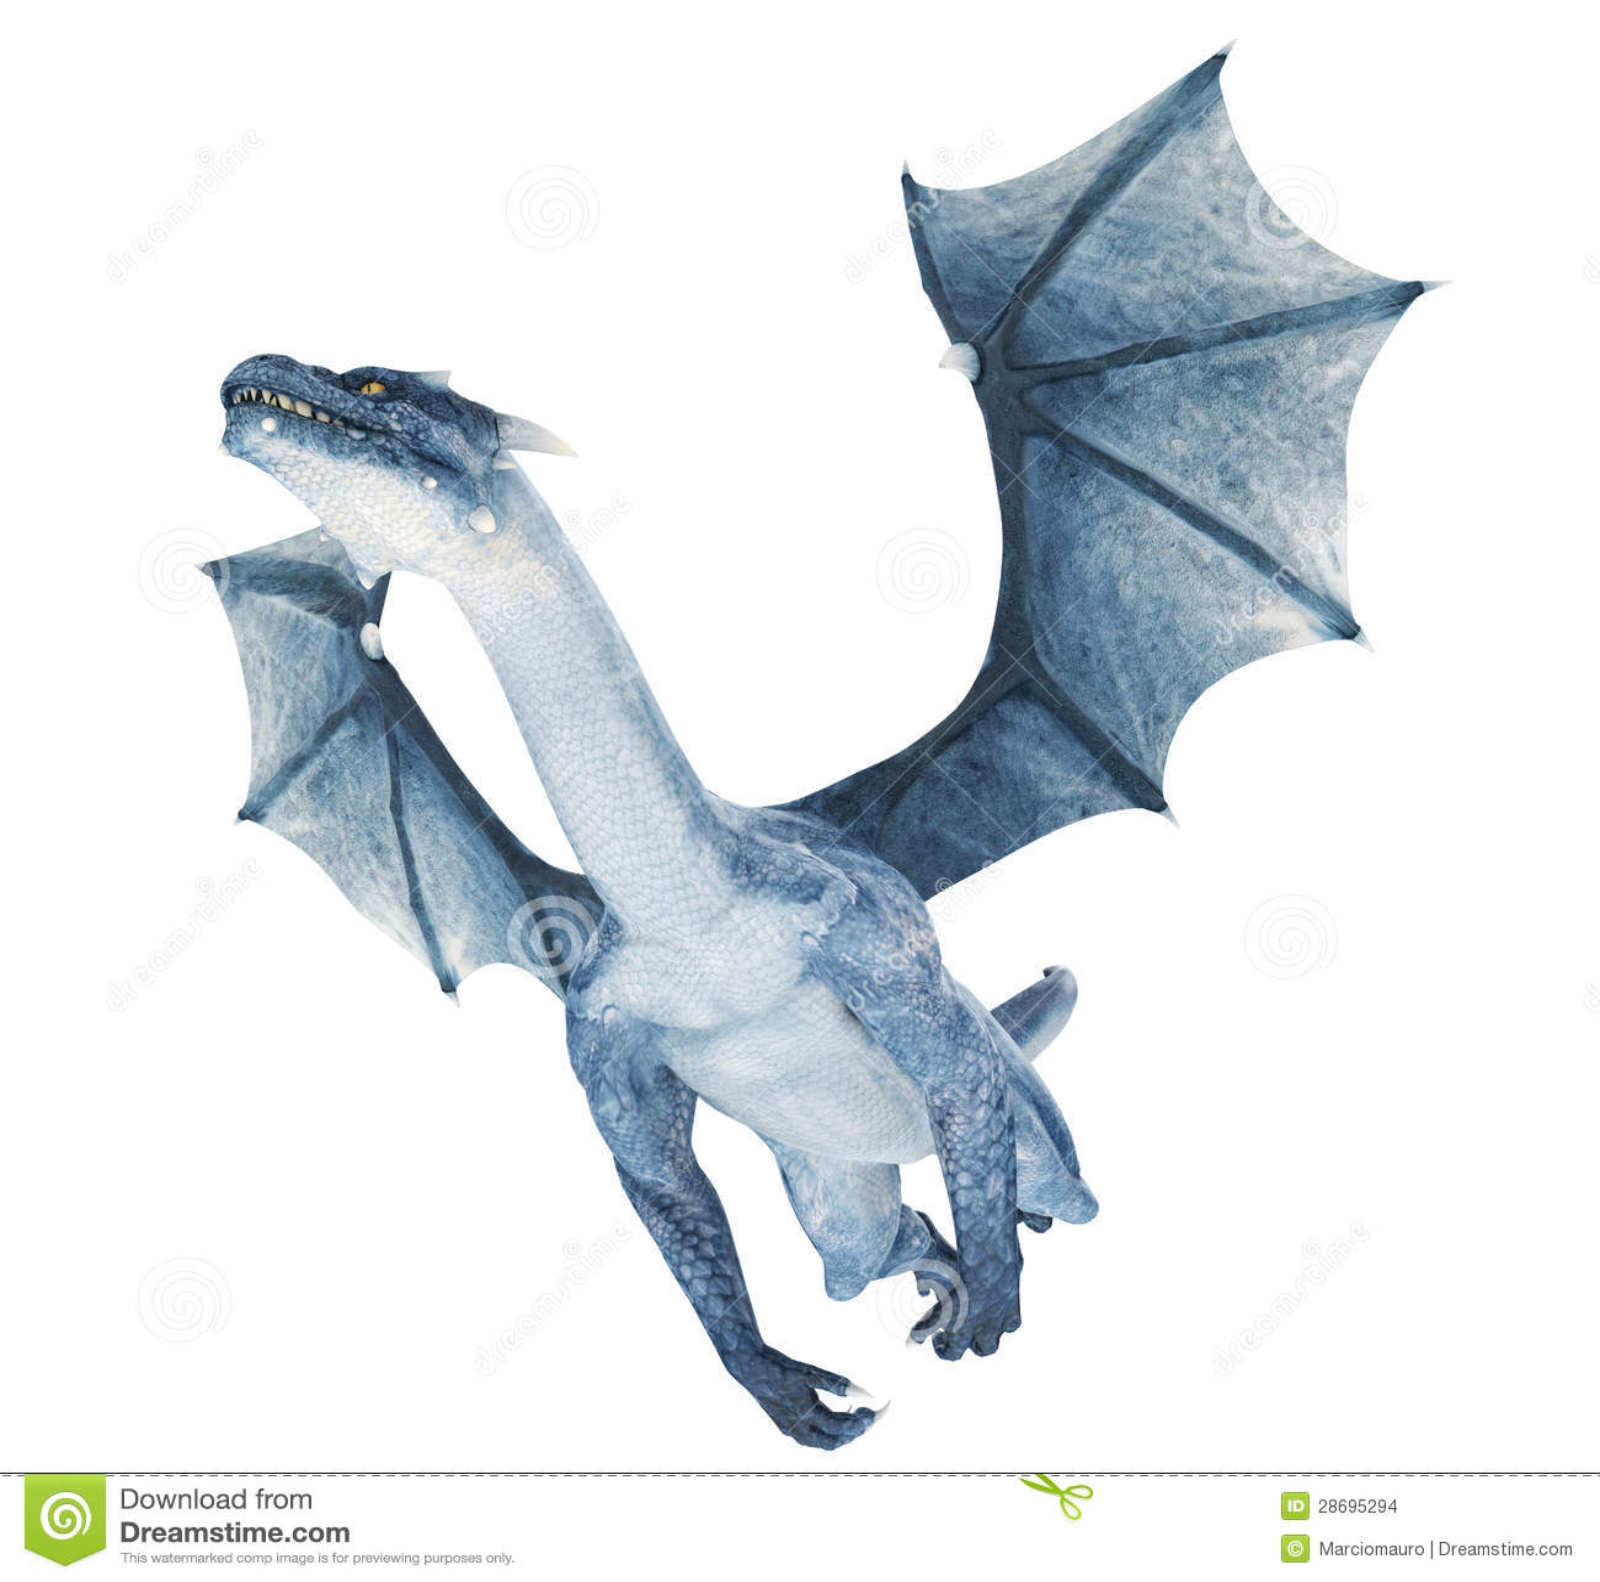 Blue Dragon Flying Stock Photo Image: 28695260 - 1300x1302 - jpeg